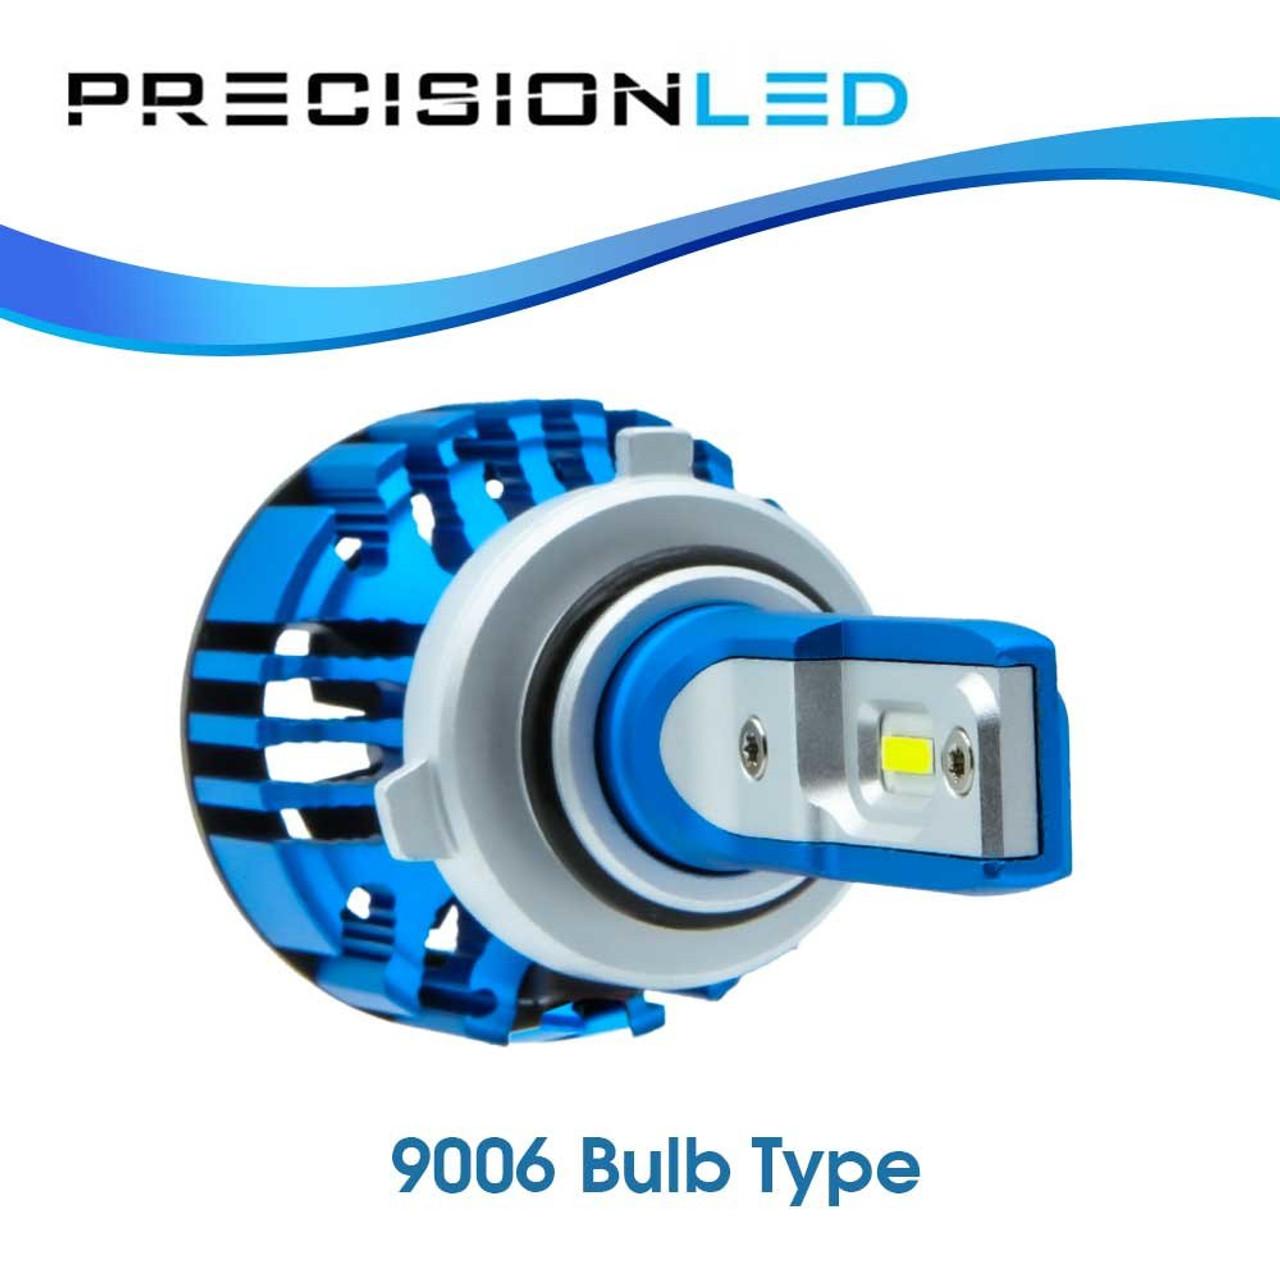 Pontiac Grand Prix Kepler LED Headlight package (2004 - 2008) bulb 2